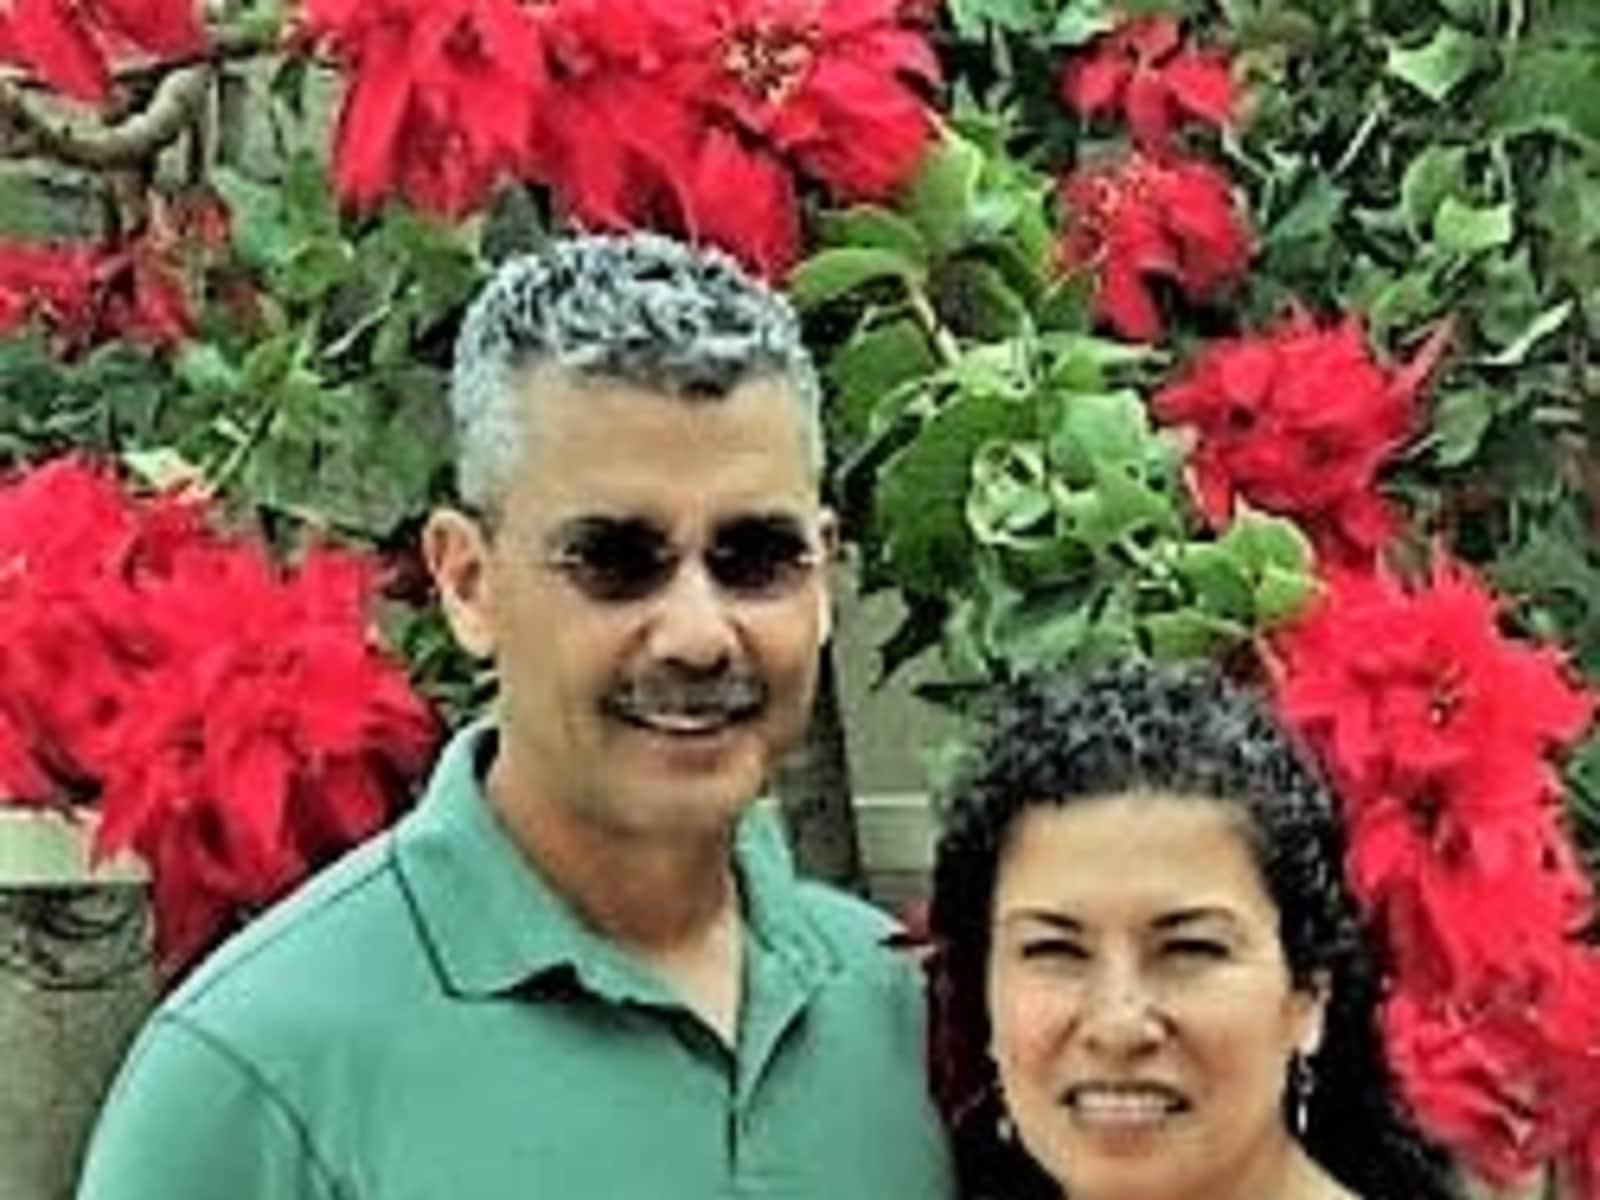 Joann & Efrain from Kansas City, Kansas, United States